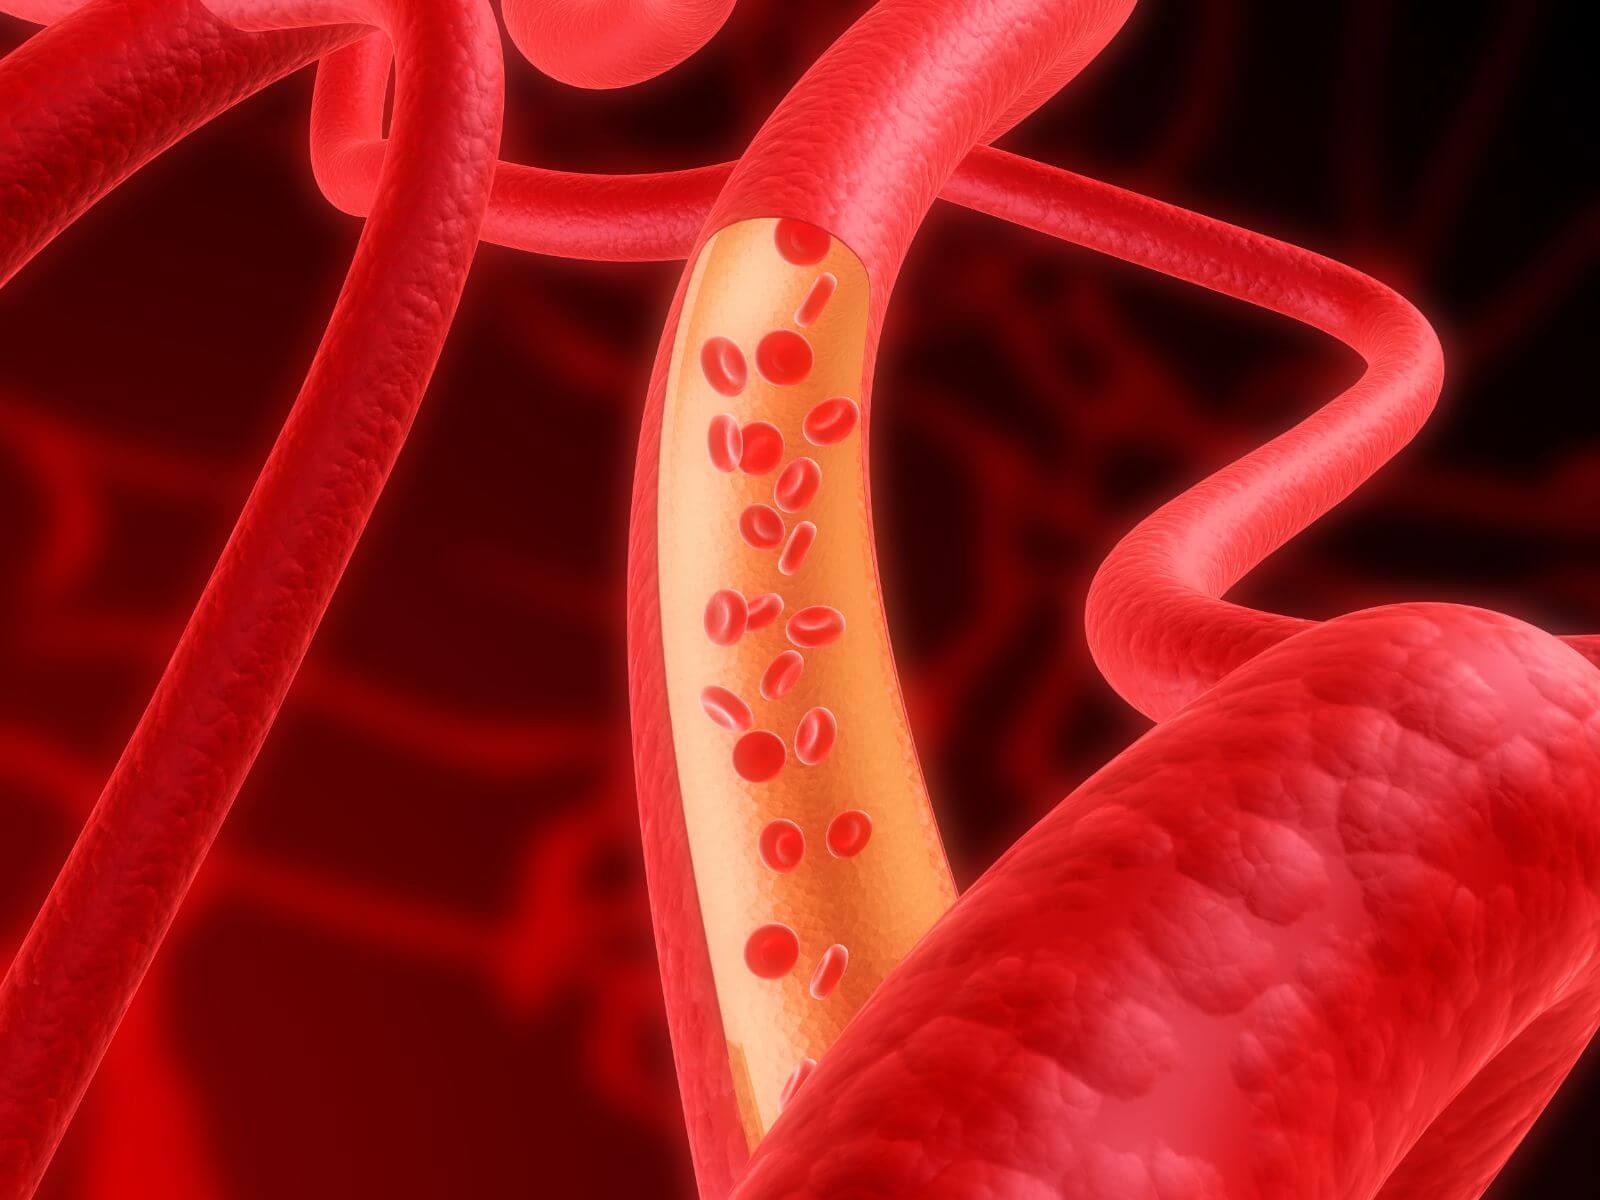 anisocitosis